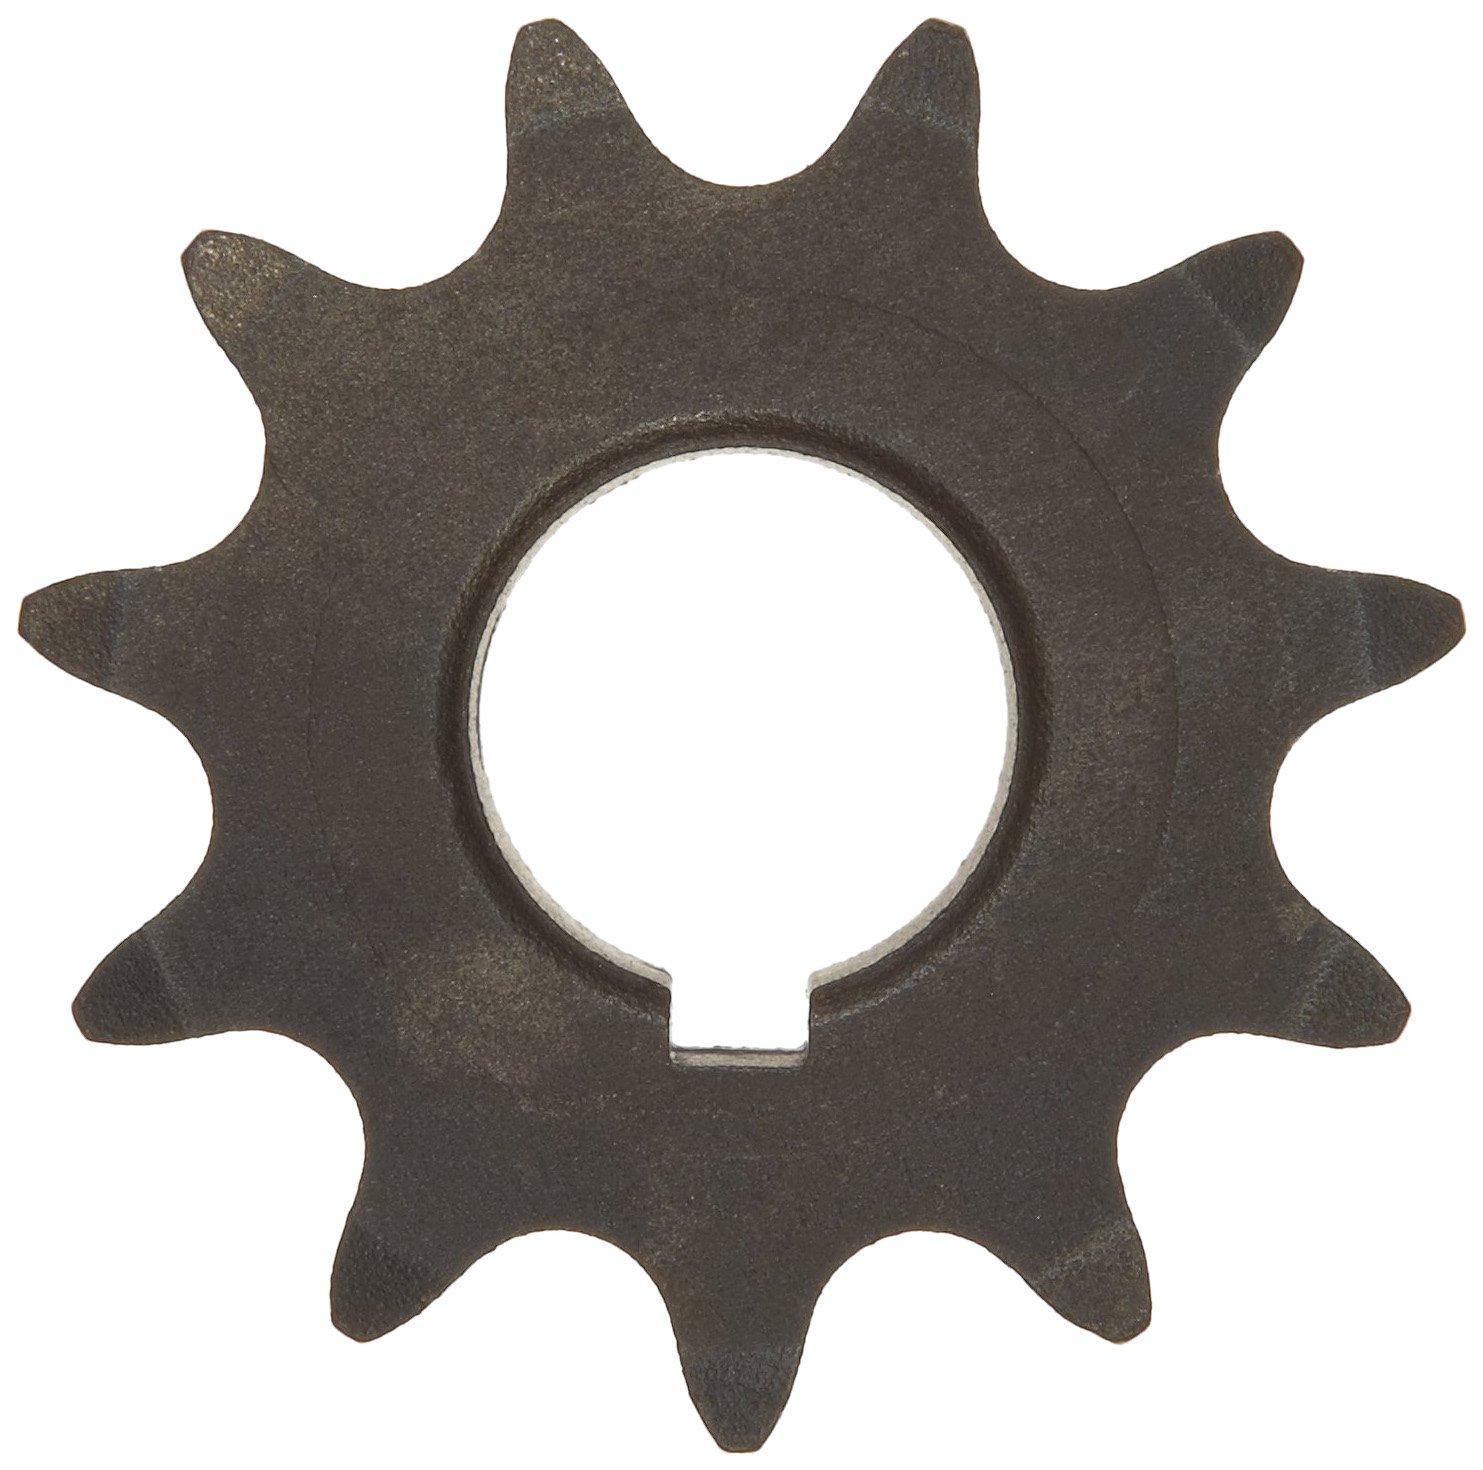 40 Chain Size Single Strand 0.875 Bore Dia. 2.166 OD 0.284 Width Bored-to-Size Type B Hub 1.5625 Hub Dia. 0.5 Pitch 12 Teeth Martin Roller Chain Sprocket